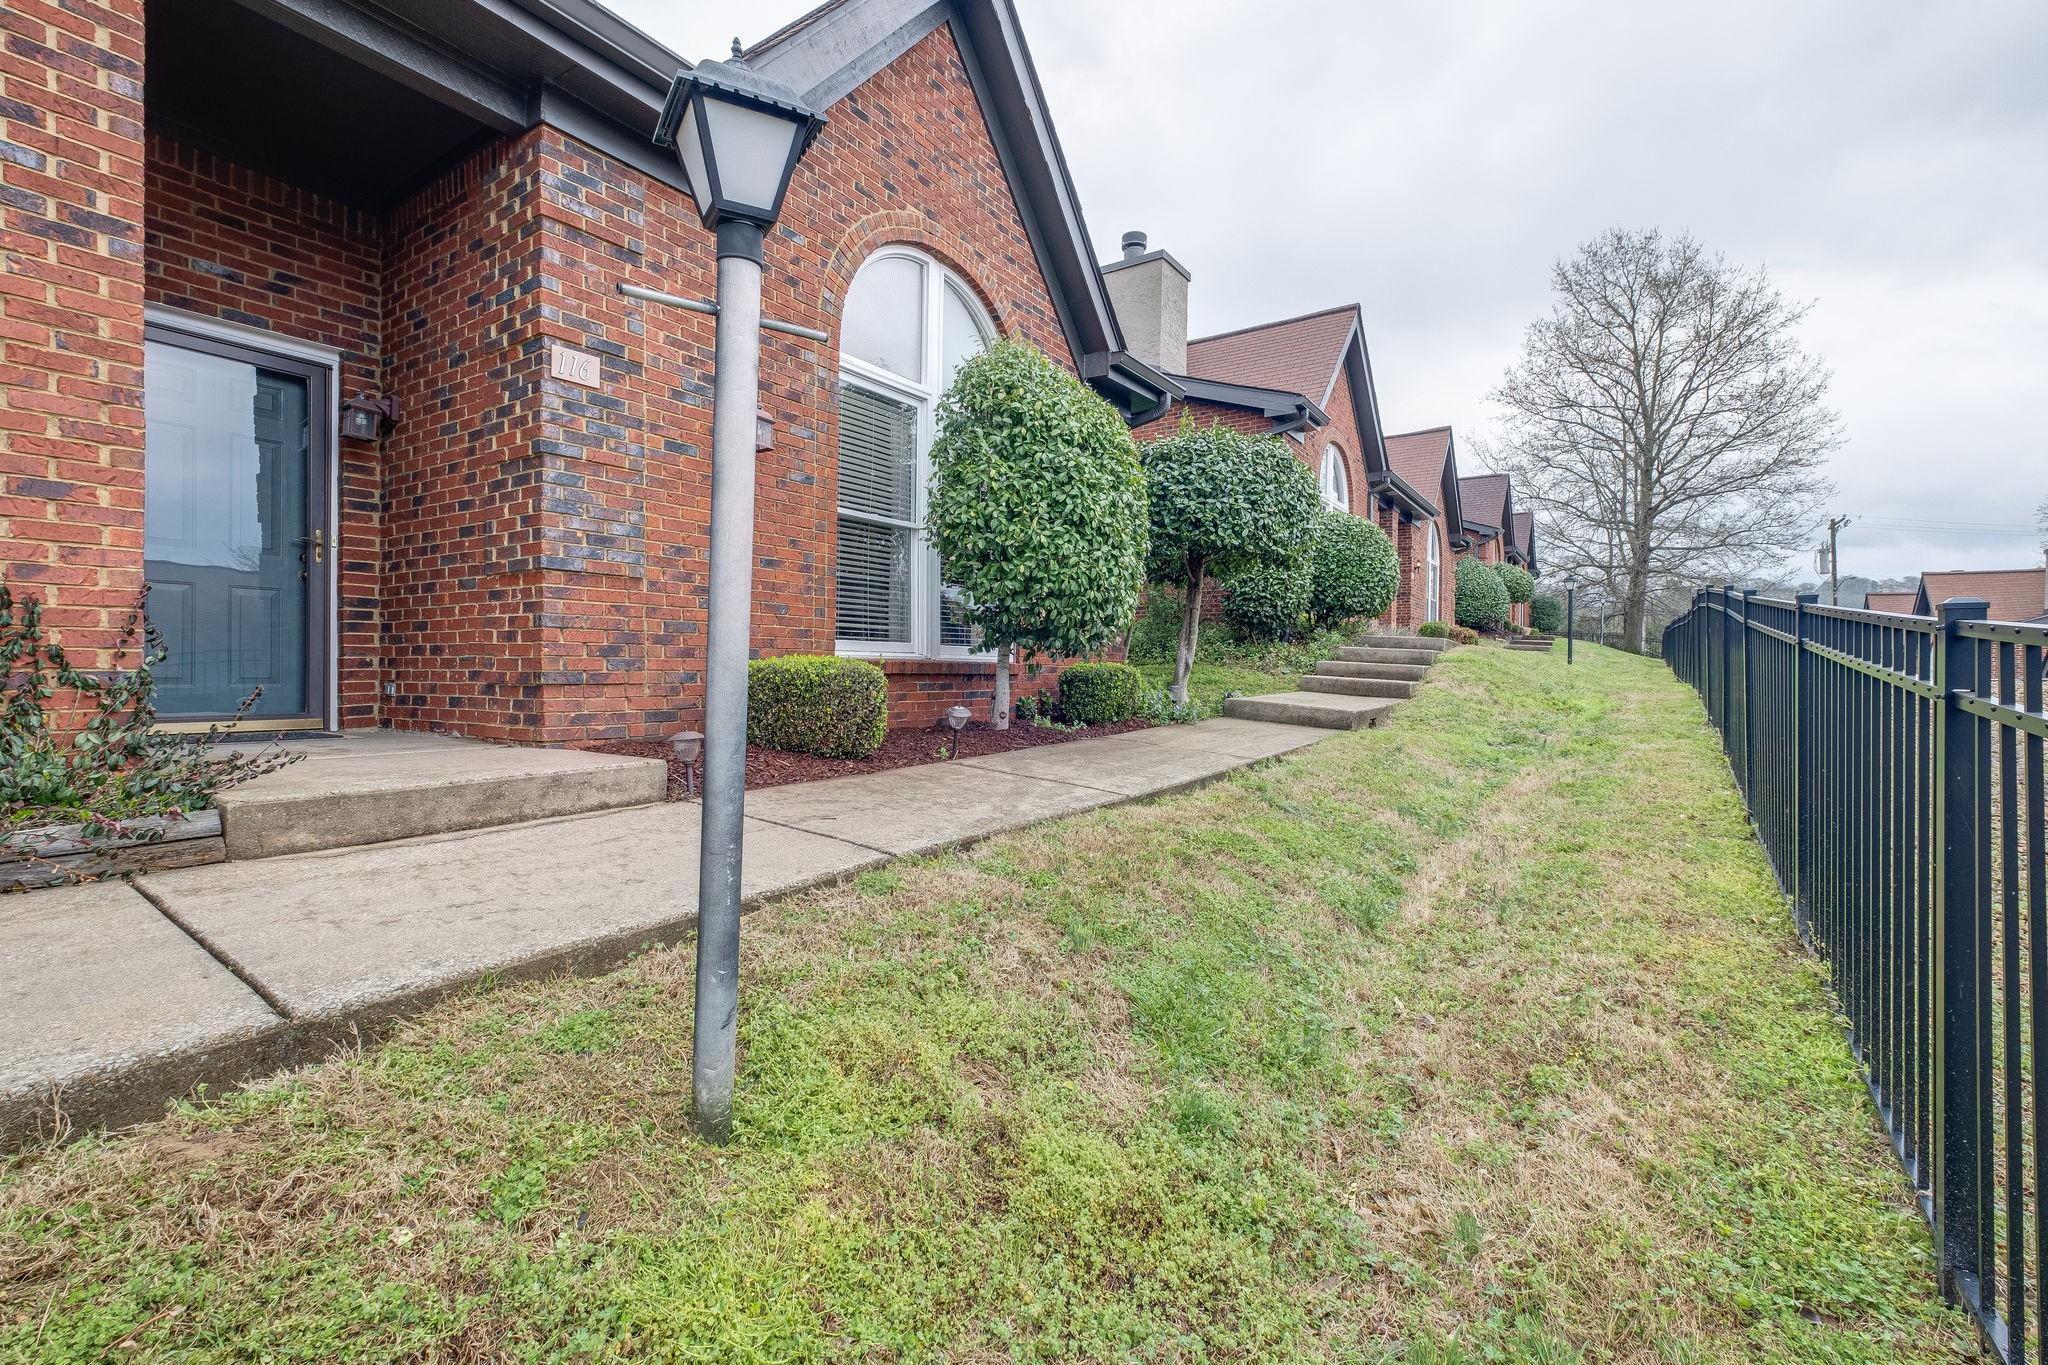 116 Highland Villa Dr, Nashville, TN 37211 - Nashville, TN real estate listing